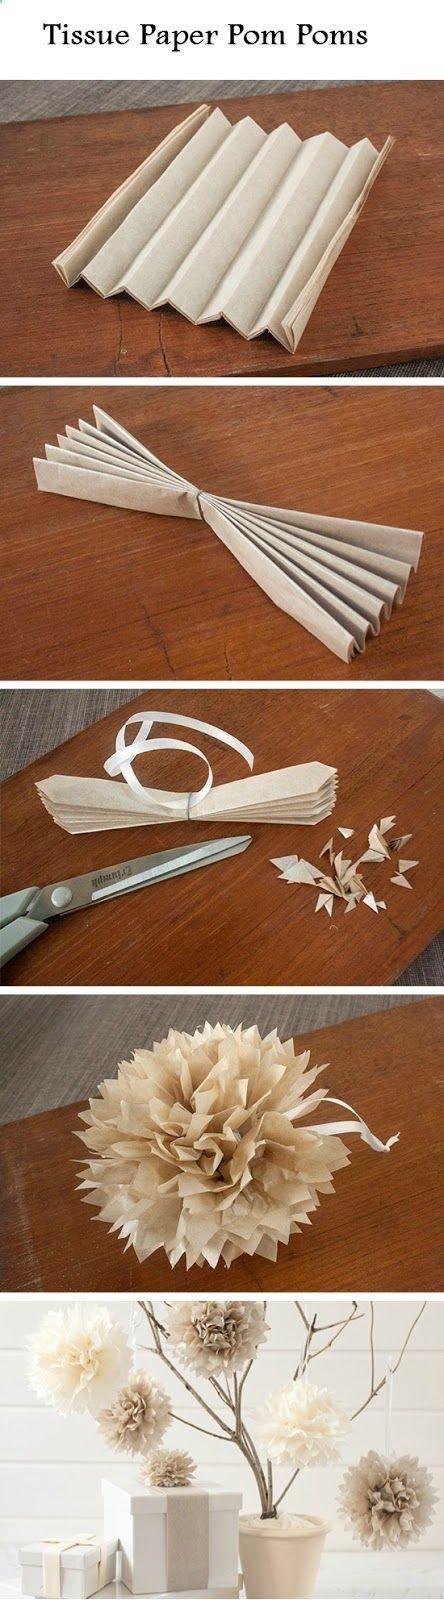 Easy Tissue Paper Pom Poms | #Crafts and #DIY Community. #TissuePaper #PomPoms